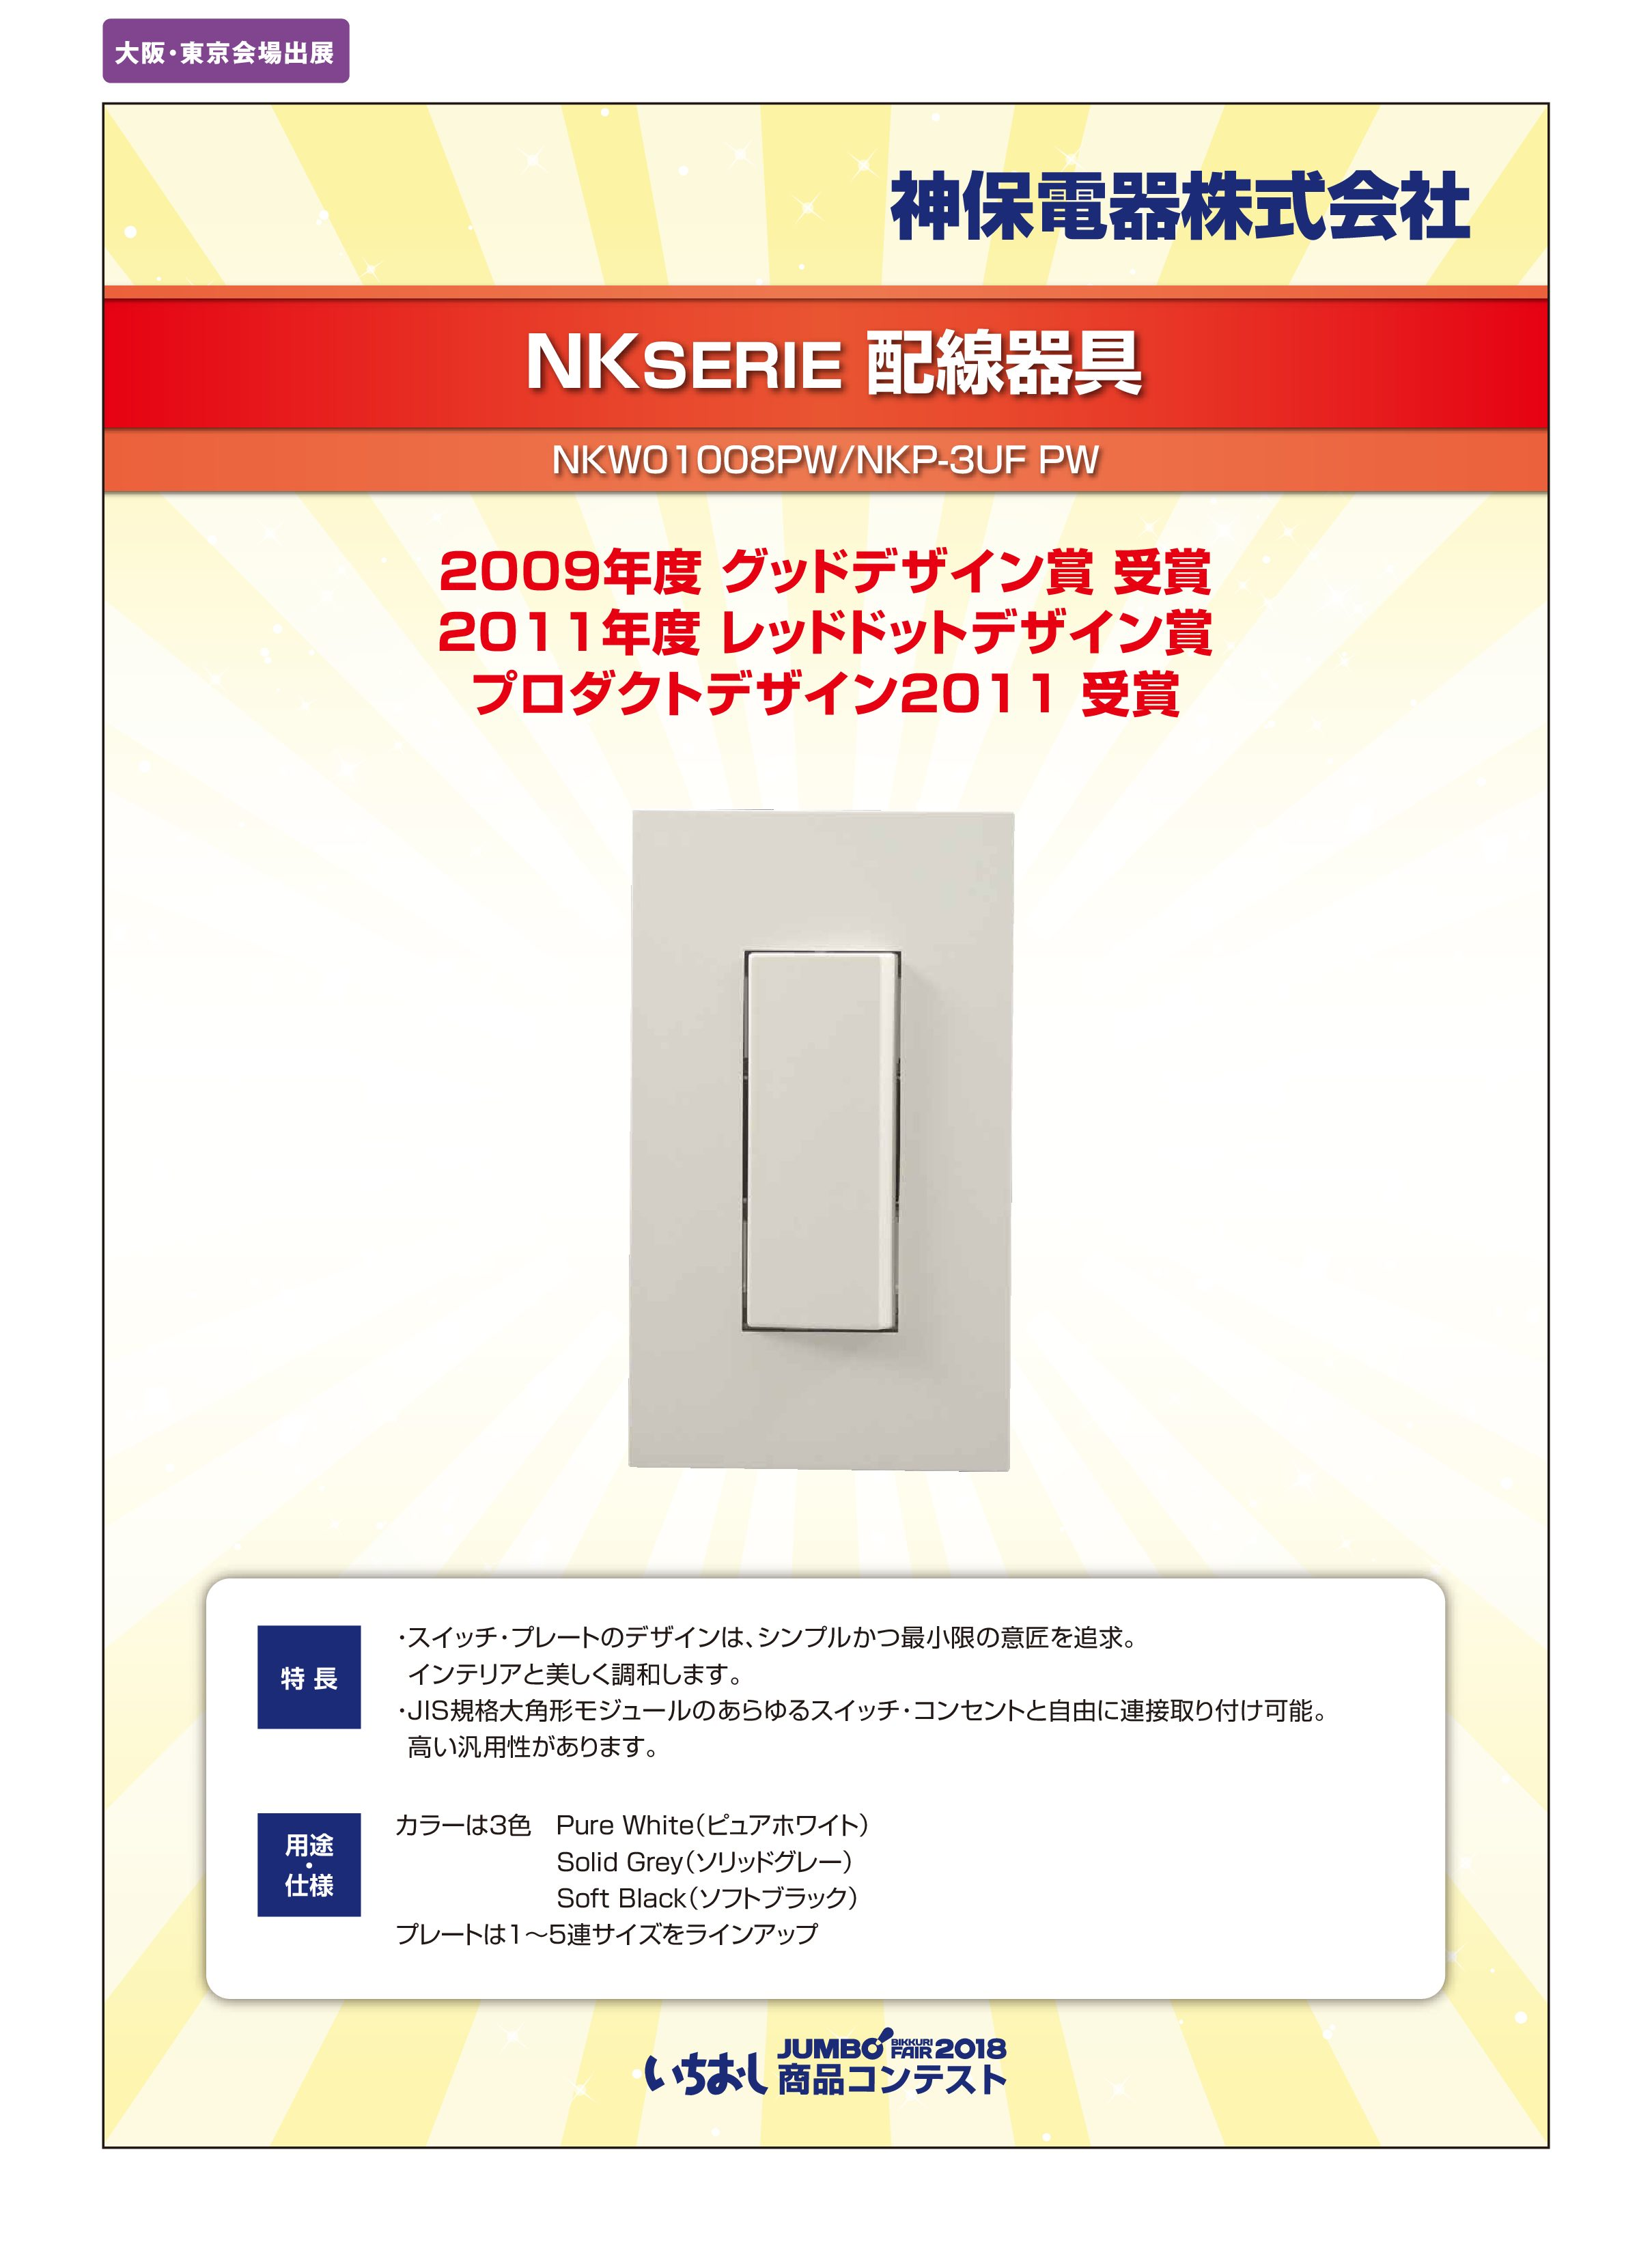 「NKSERIE 配線器具」神保電器株式会社の画像